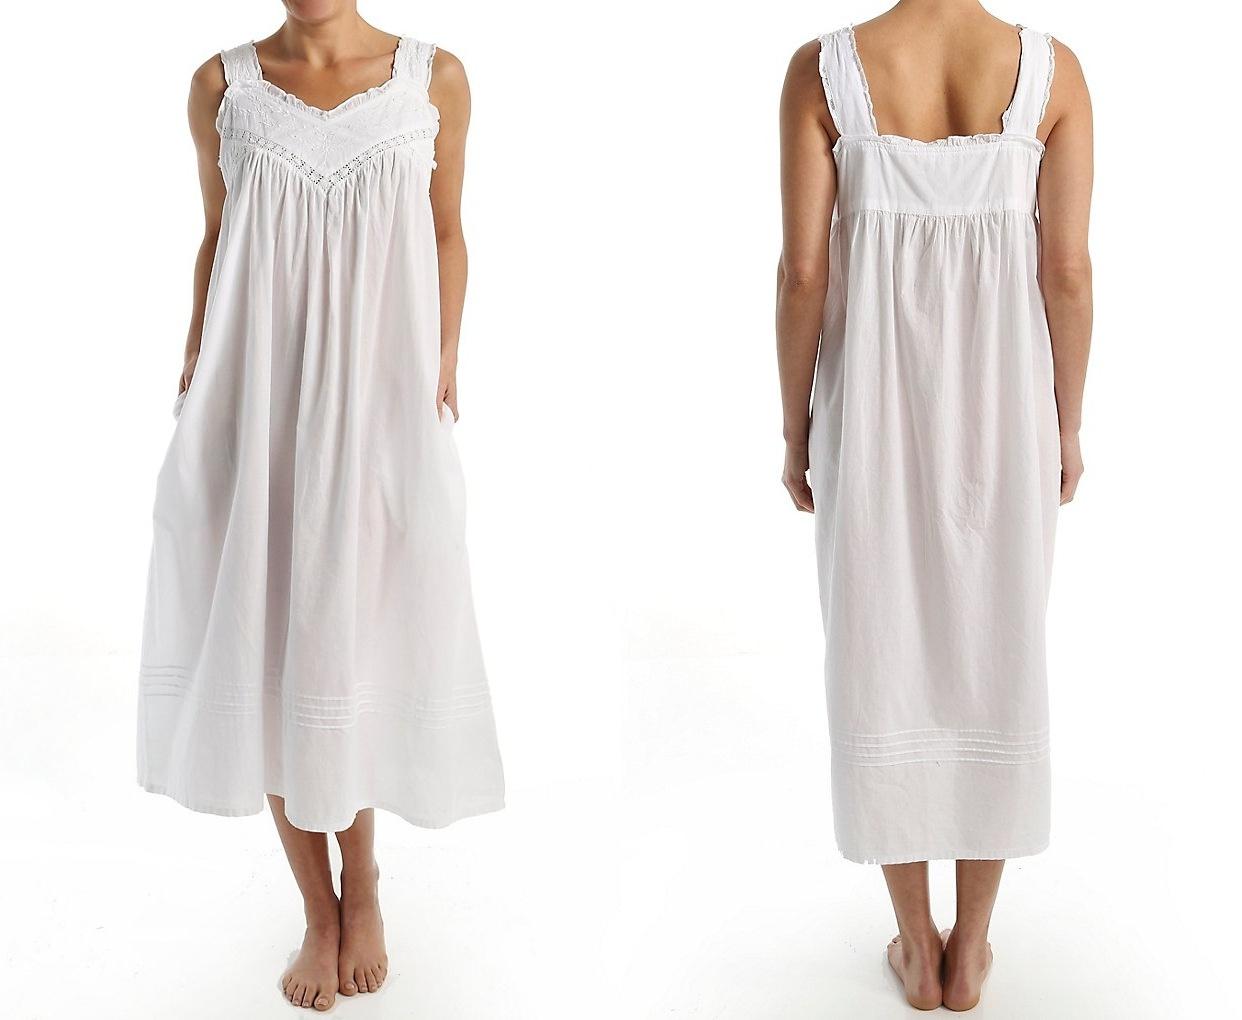 victorian sleepwear